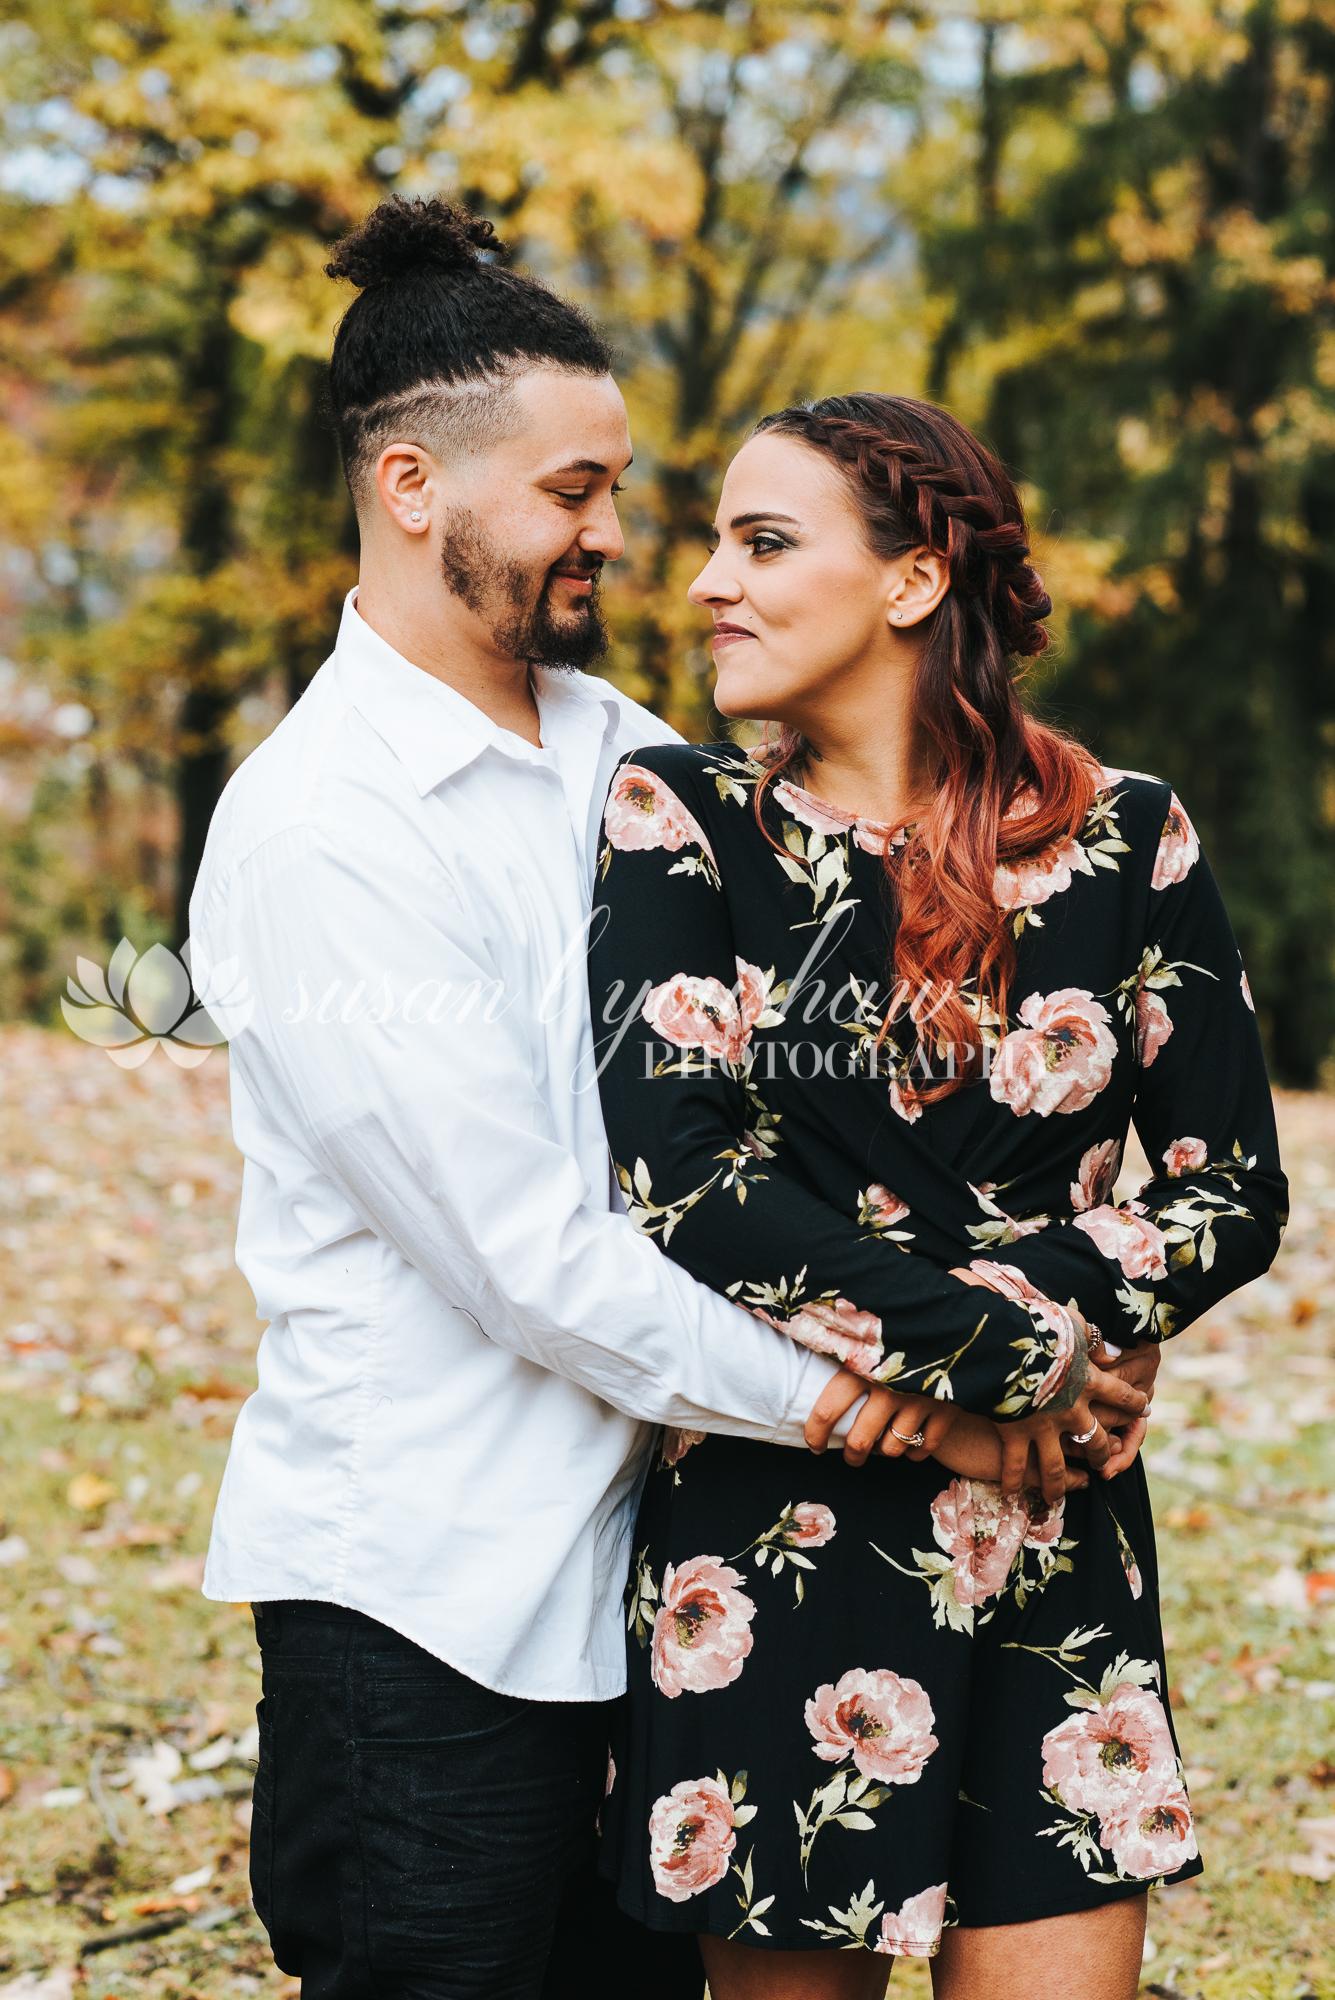 BLOG Theresa and Donavyn 10-28-2018-4.jpg